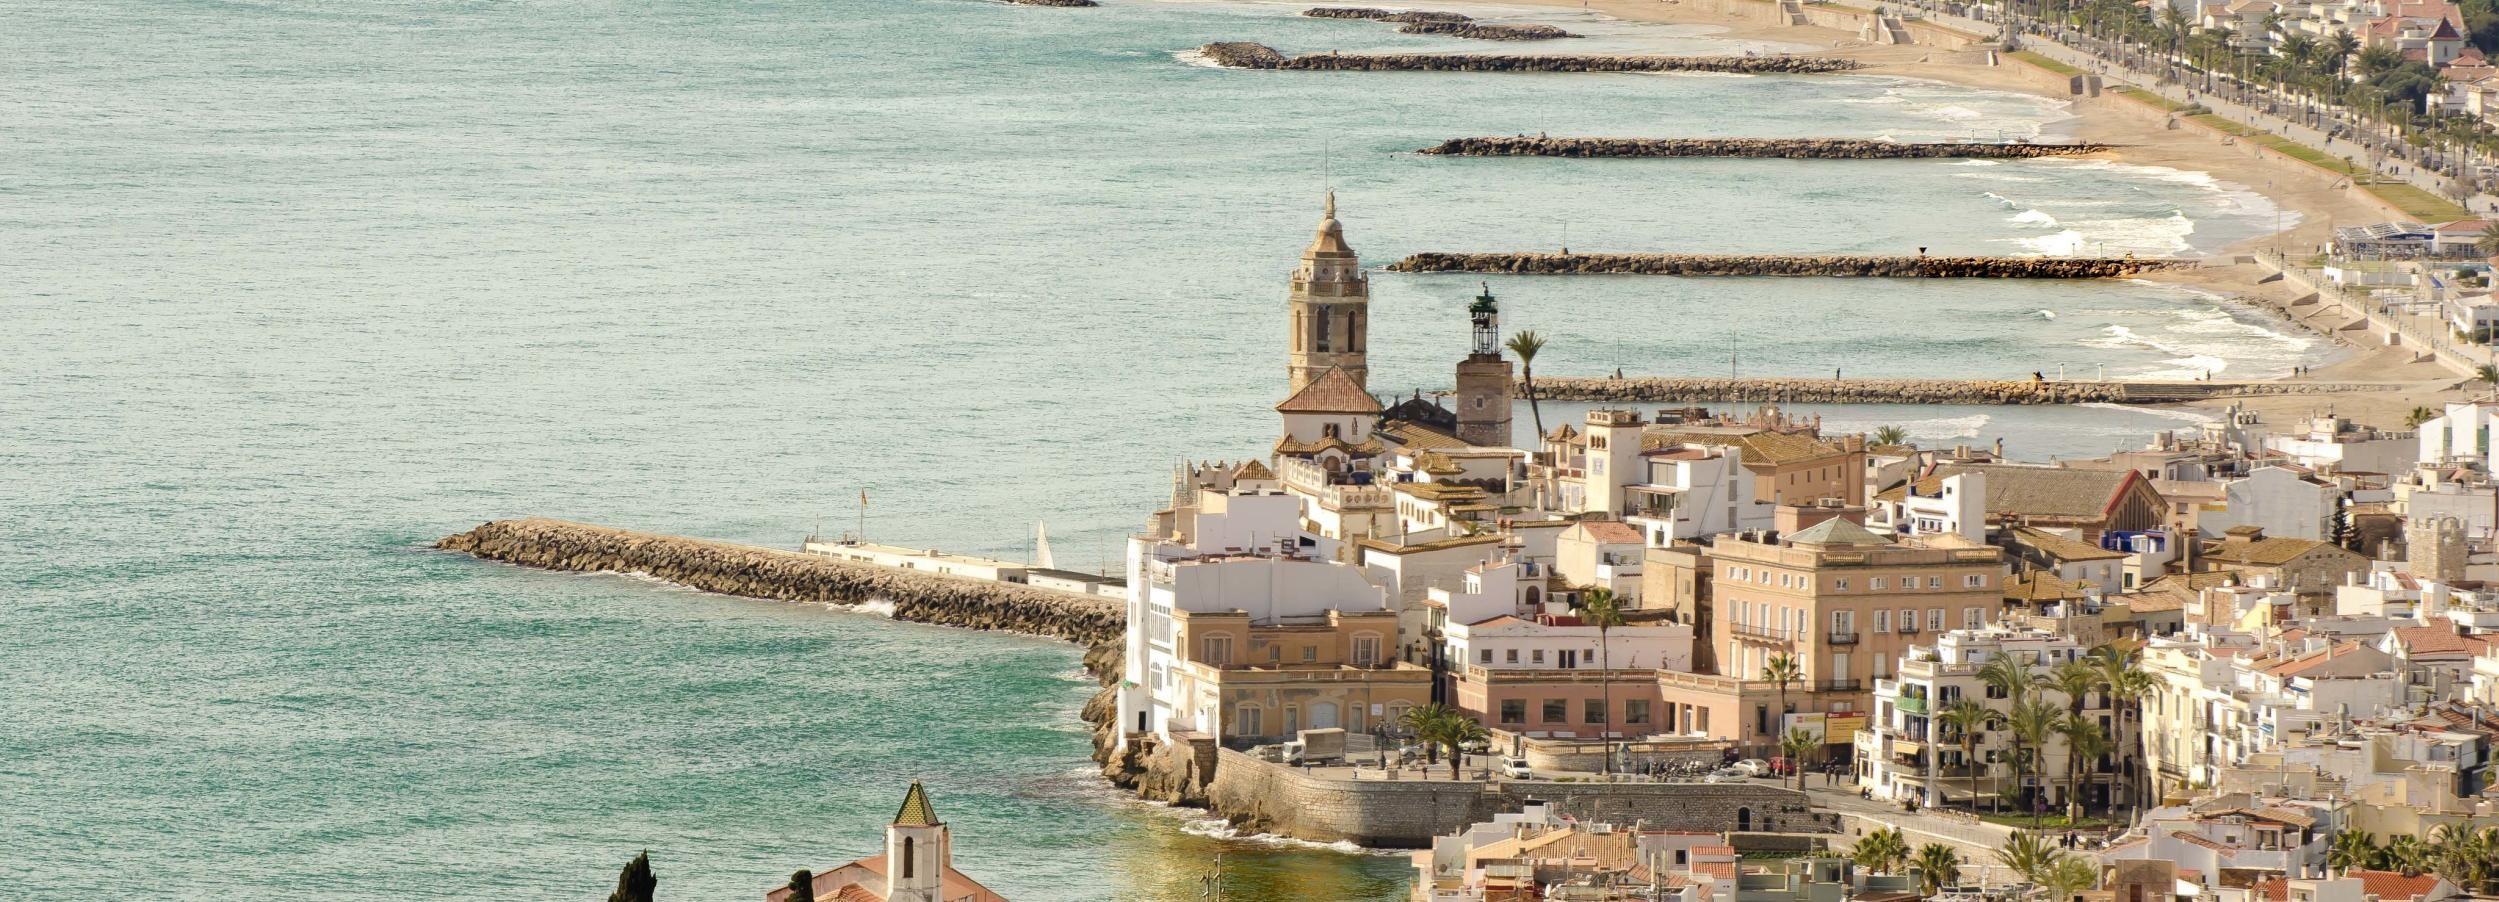 Ab Barcelona: Private 5-stündige Tour nach Sitges